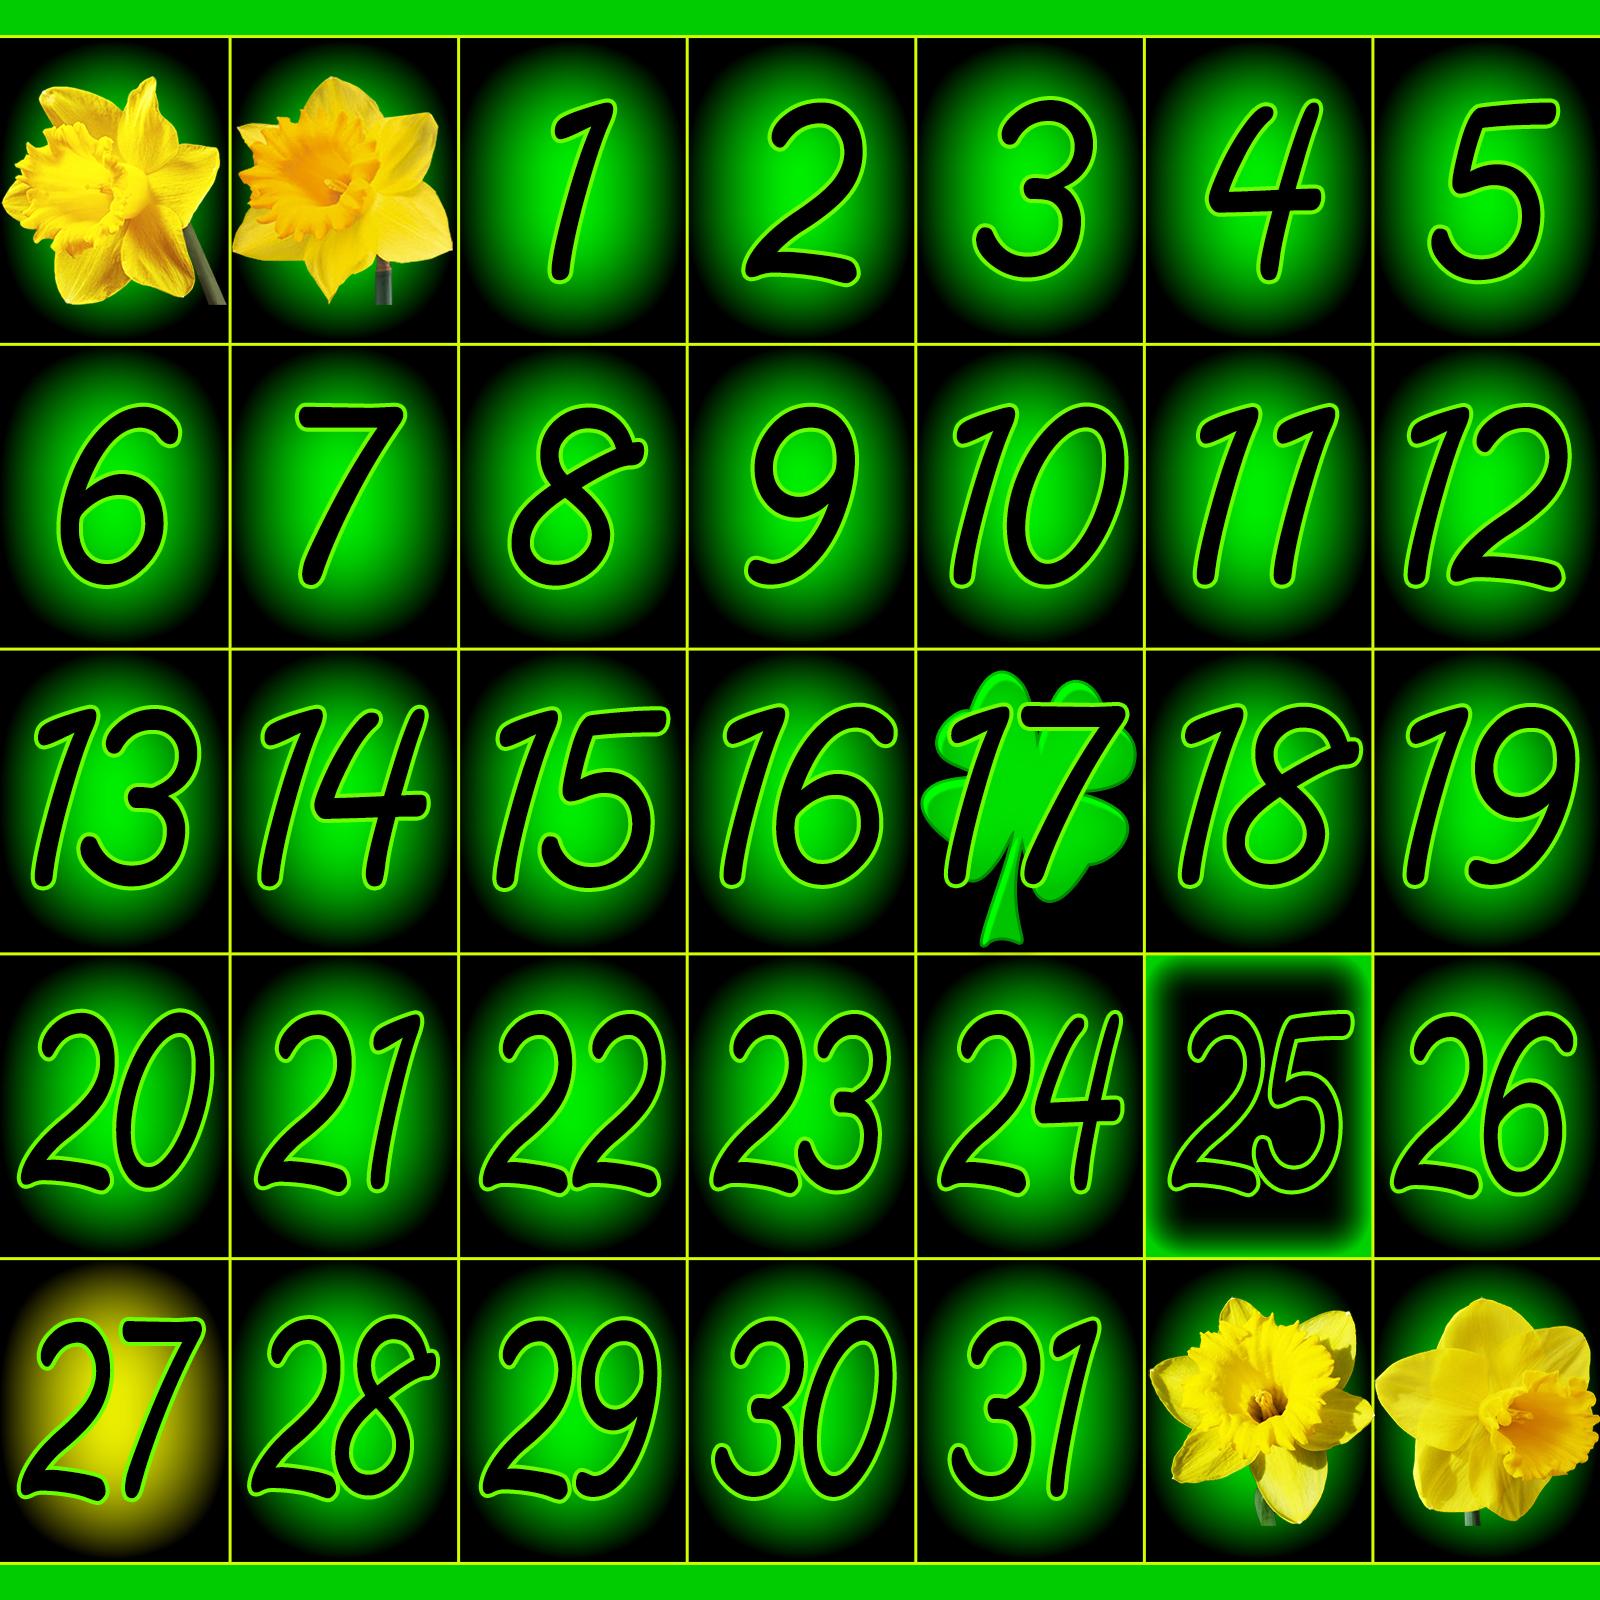 March Calendar 2016 1600 x 1600 px 1600x1600